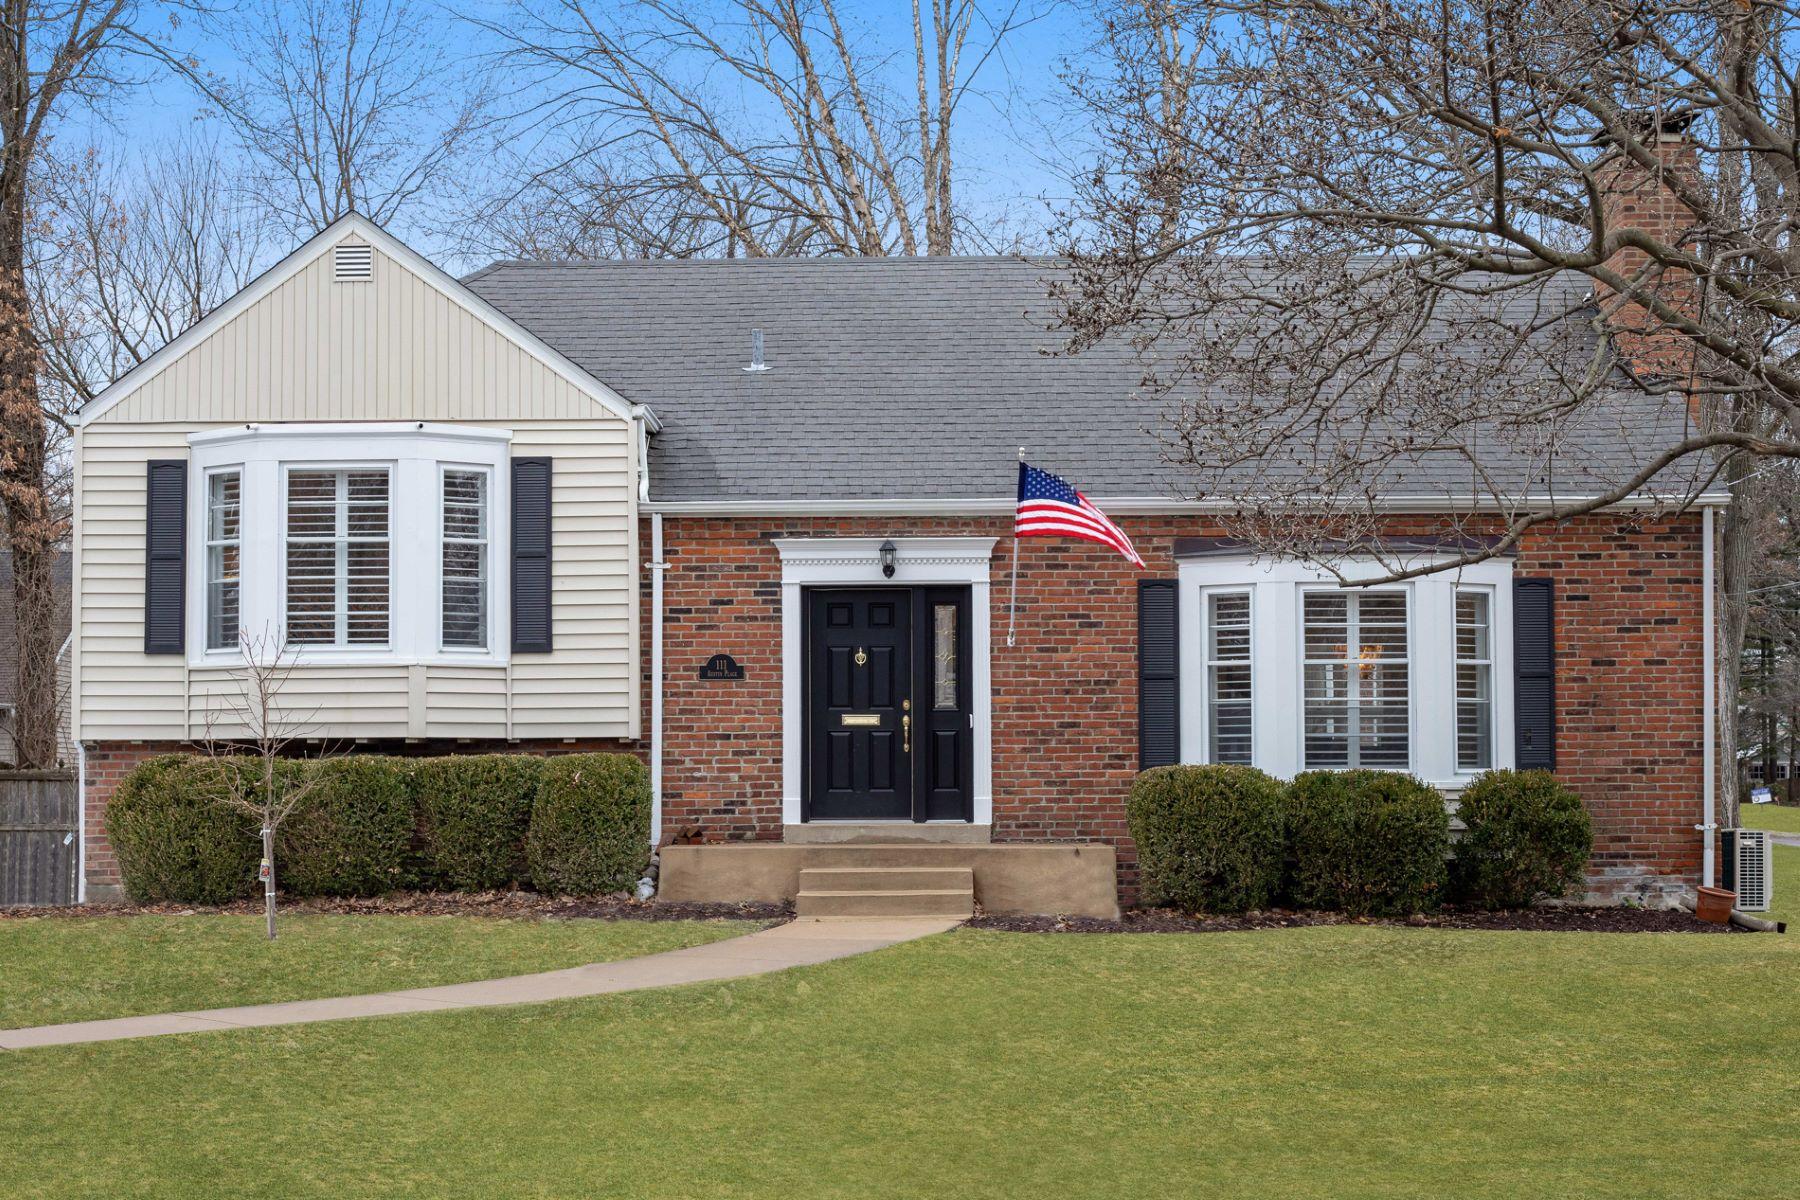 Single Family Home for Sale at Austin Place 111 Austin Place St. Louis, Missouri 63122 United States